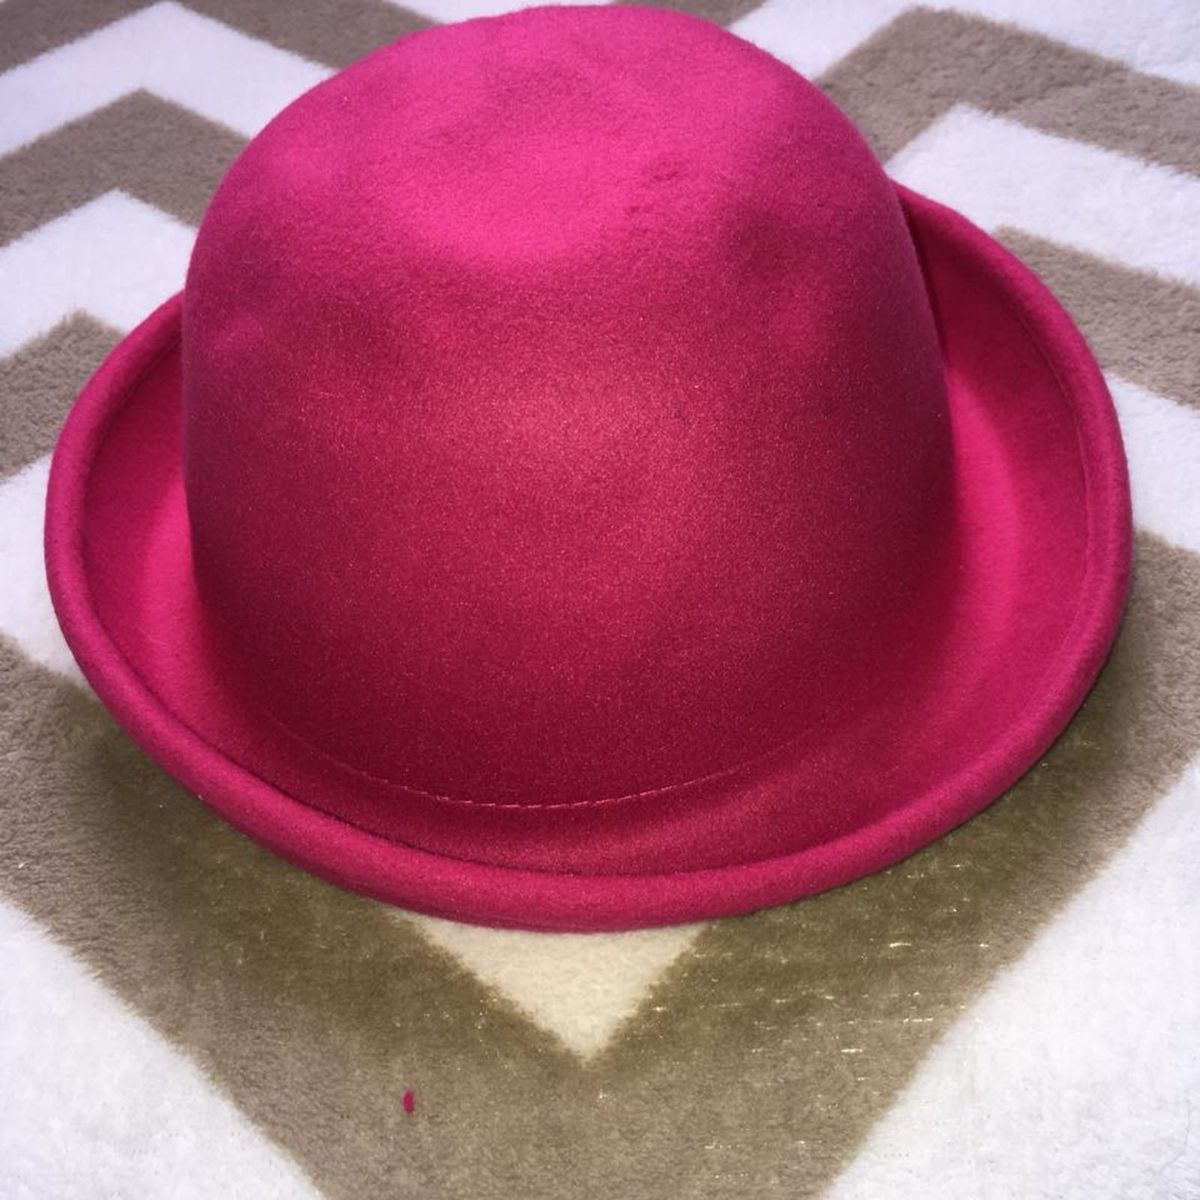 chapéu coco rosa pink - chapeu sem marca.  Czm6ly9wag90b3muzw5qb2vplmnvbs5ici9wcm9kdwn0cy82mda3odevogi5ytzmnwm1nzuyodi0ngyxmjy0otljodvjnjnkyjyuanbn  ... c40f7c46fce